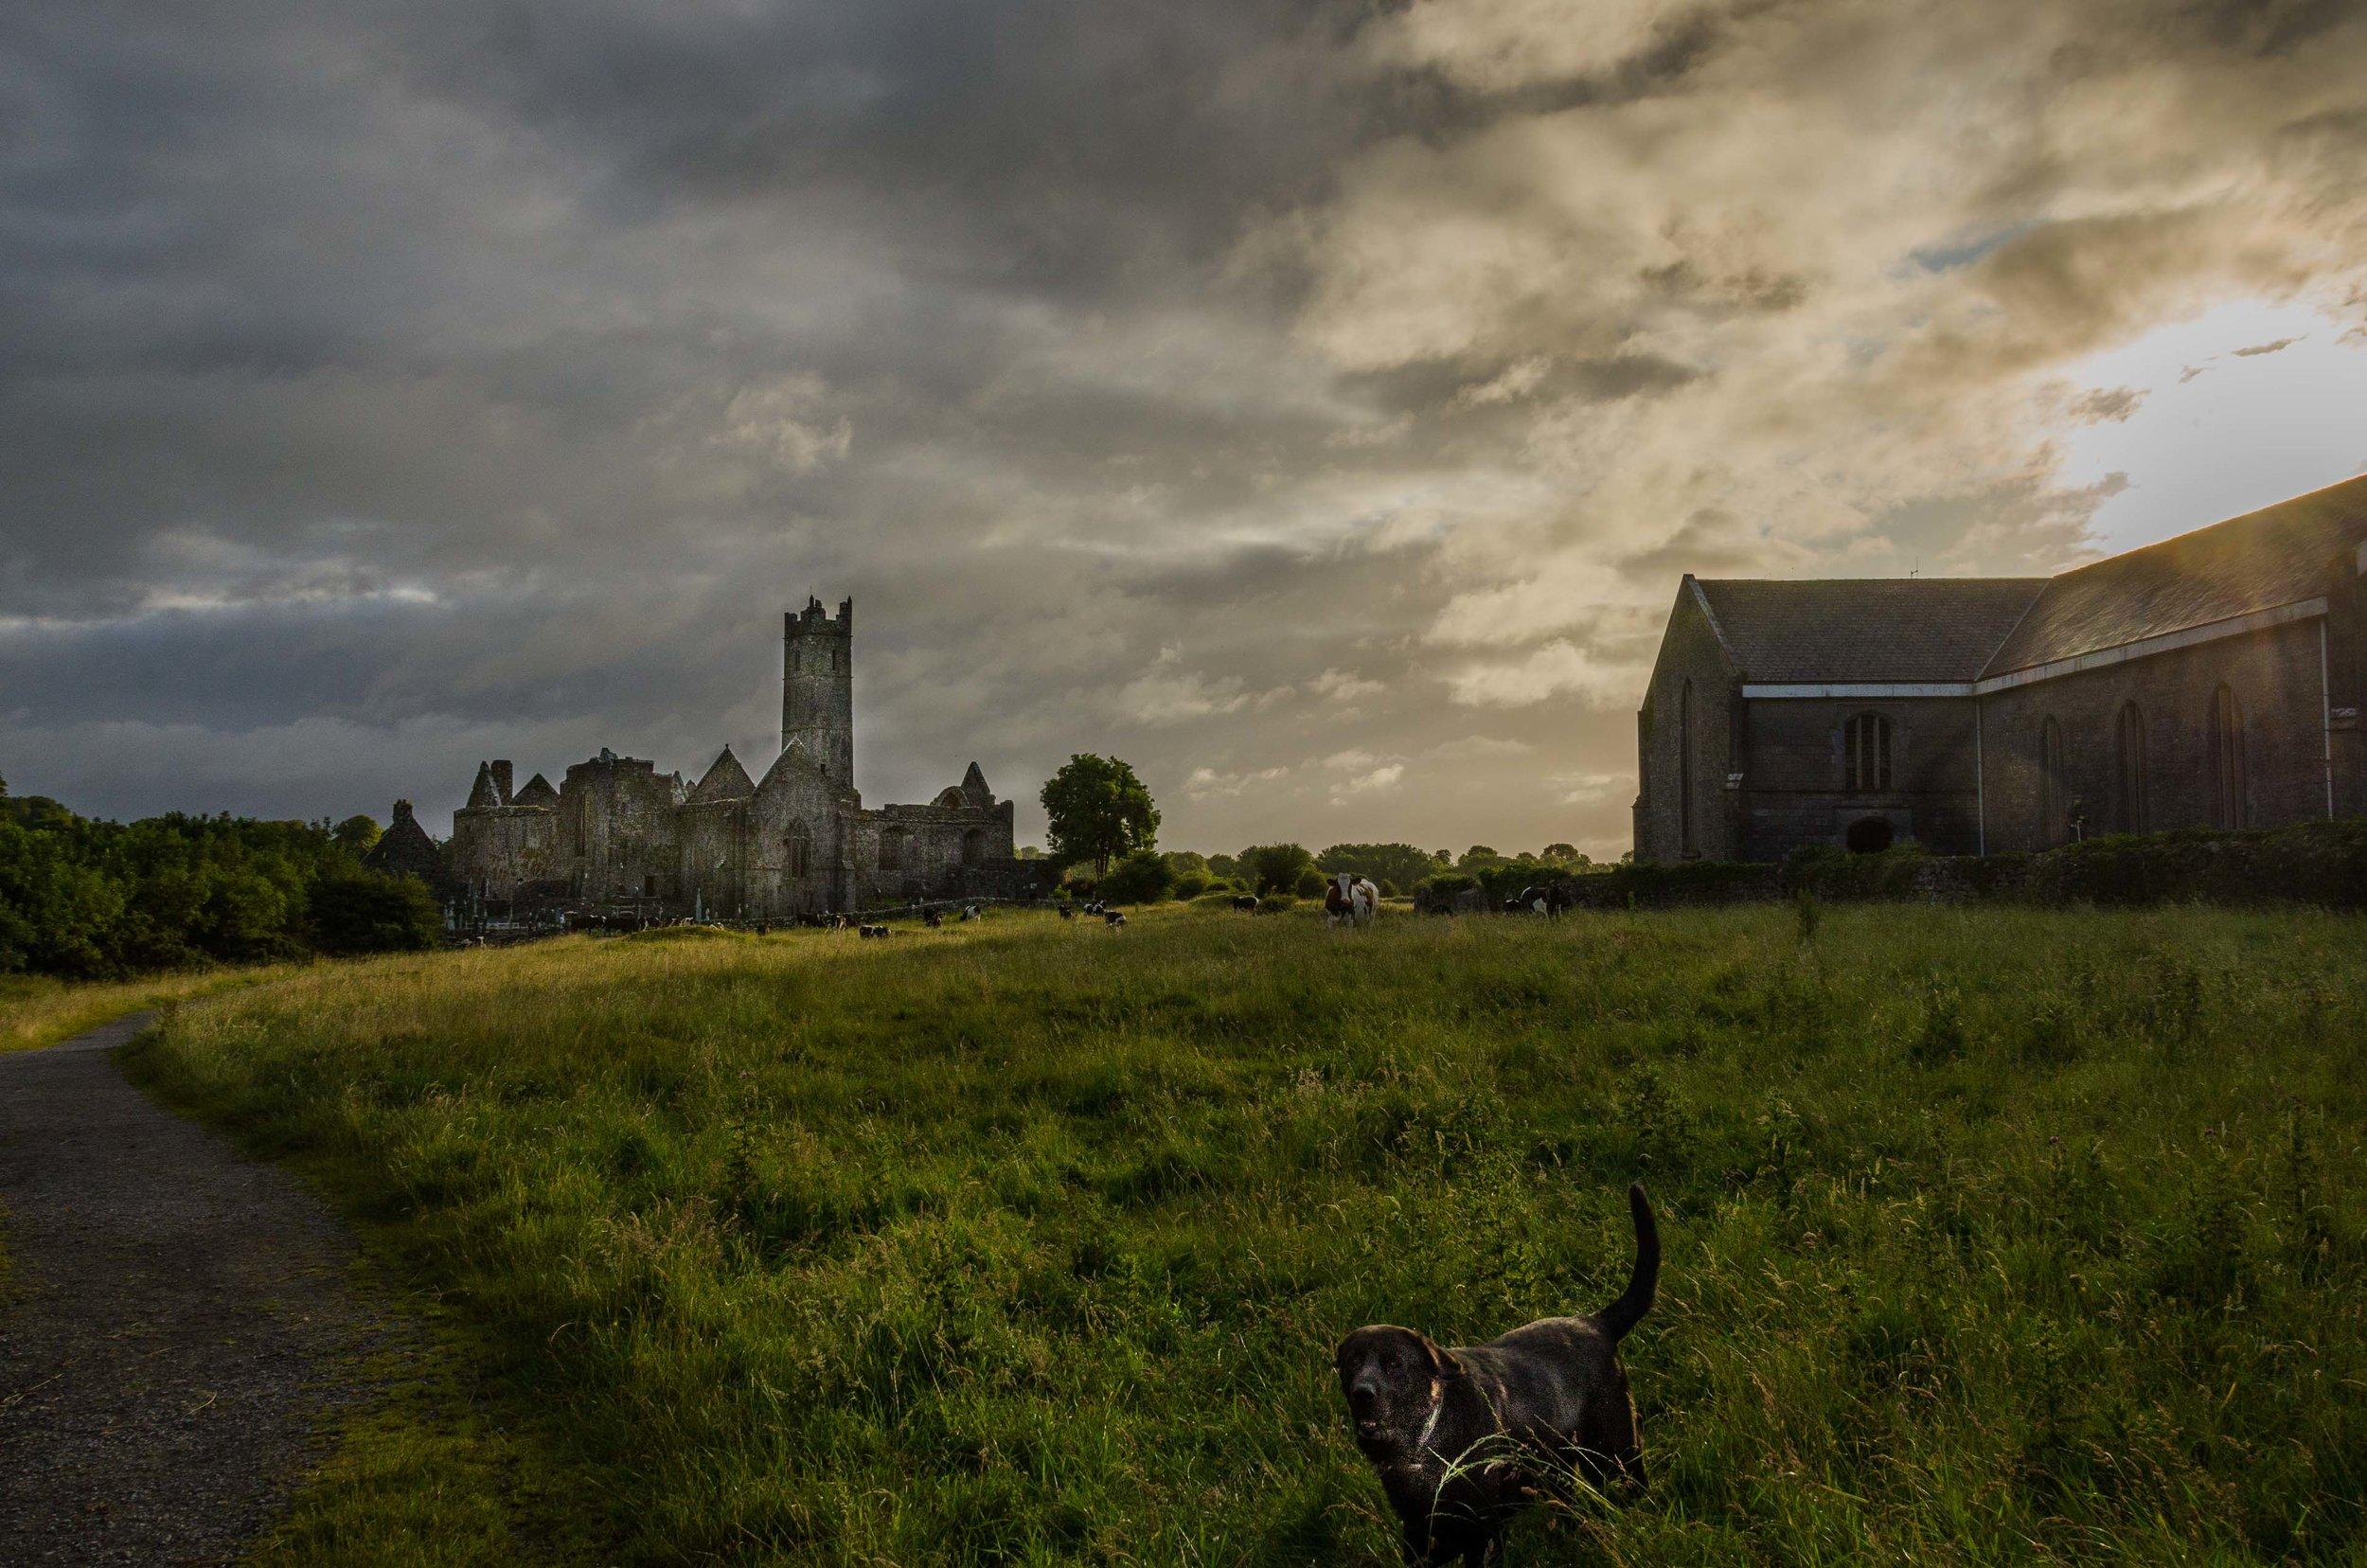 Quin Abbey County Clare, Ireland 2015